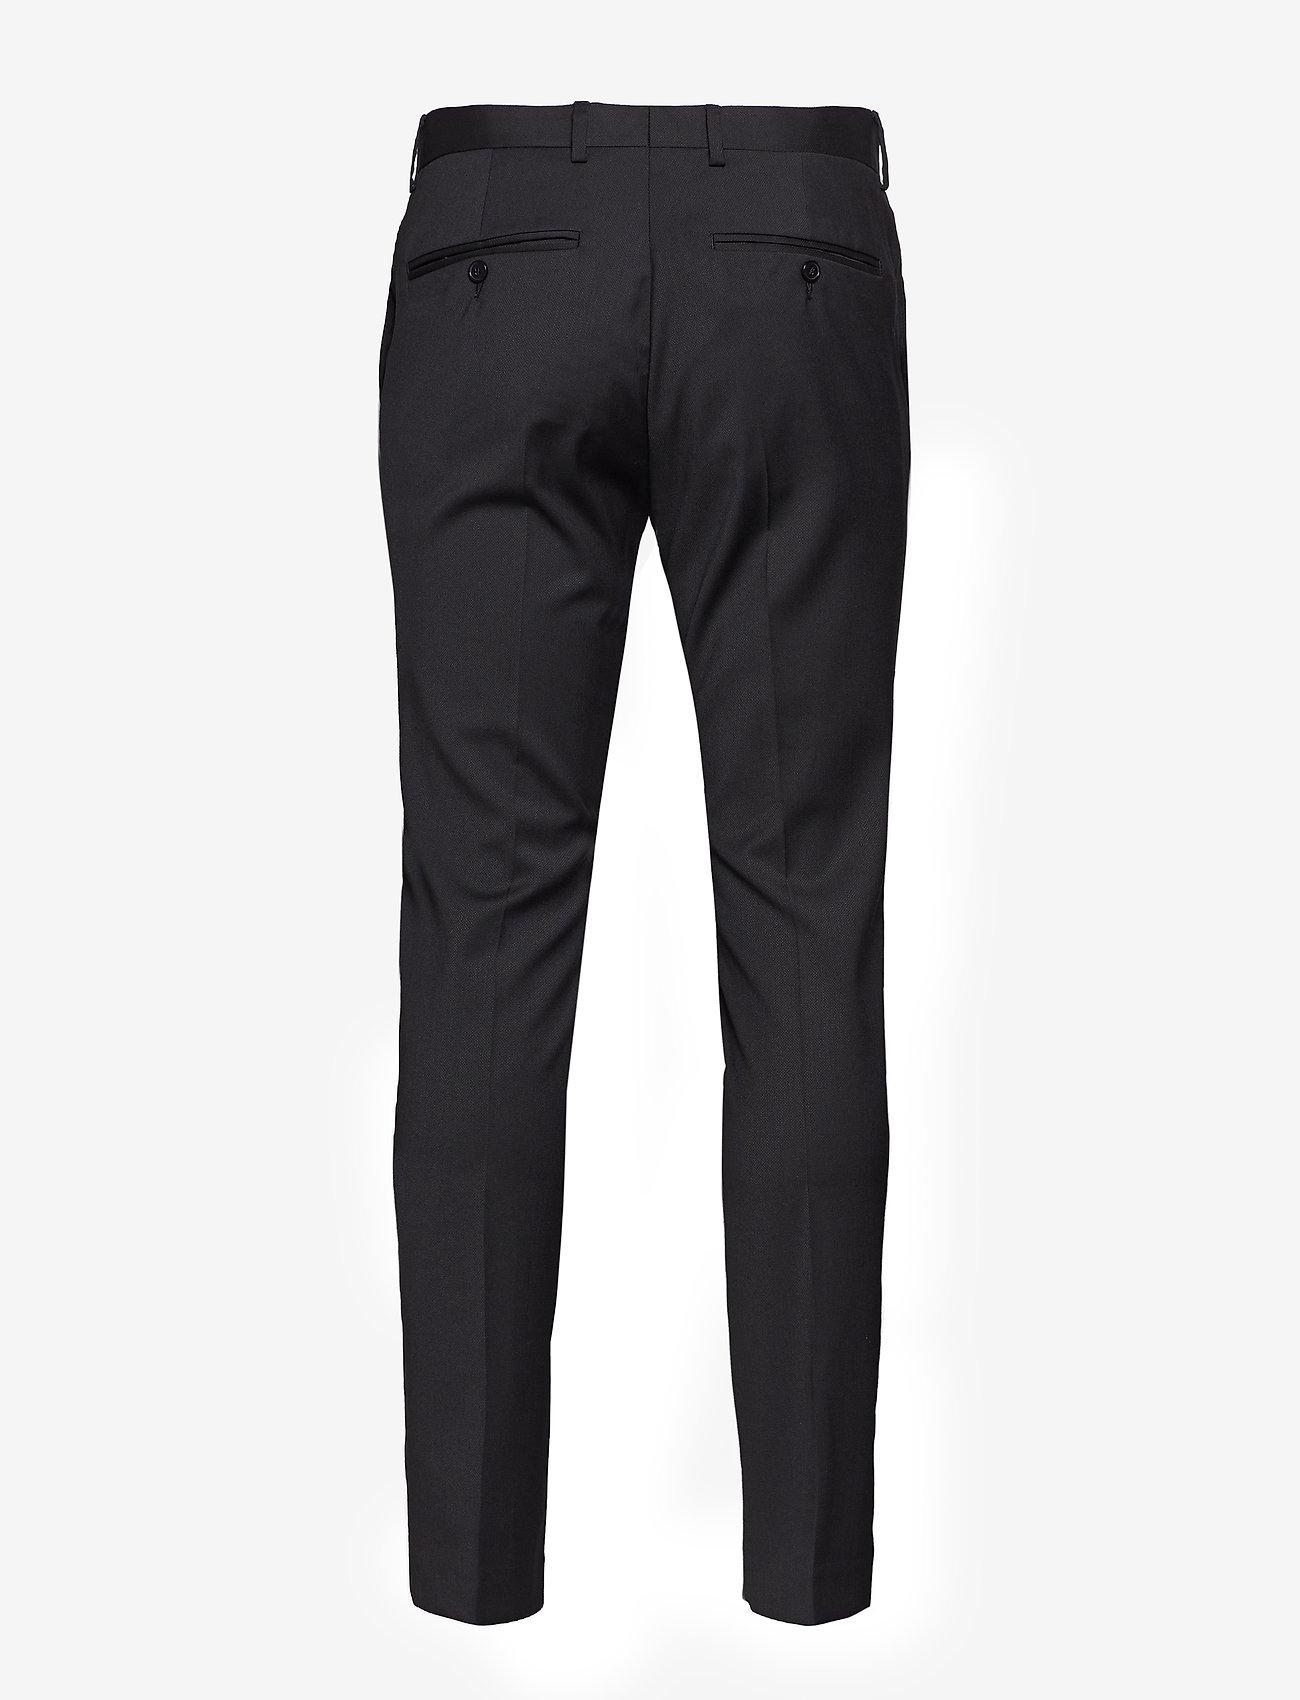 Selected Homme - SLHSLIM-MYLOBILL BLACK TRS B NOOS - suitbukser - black - 1